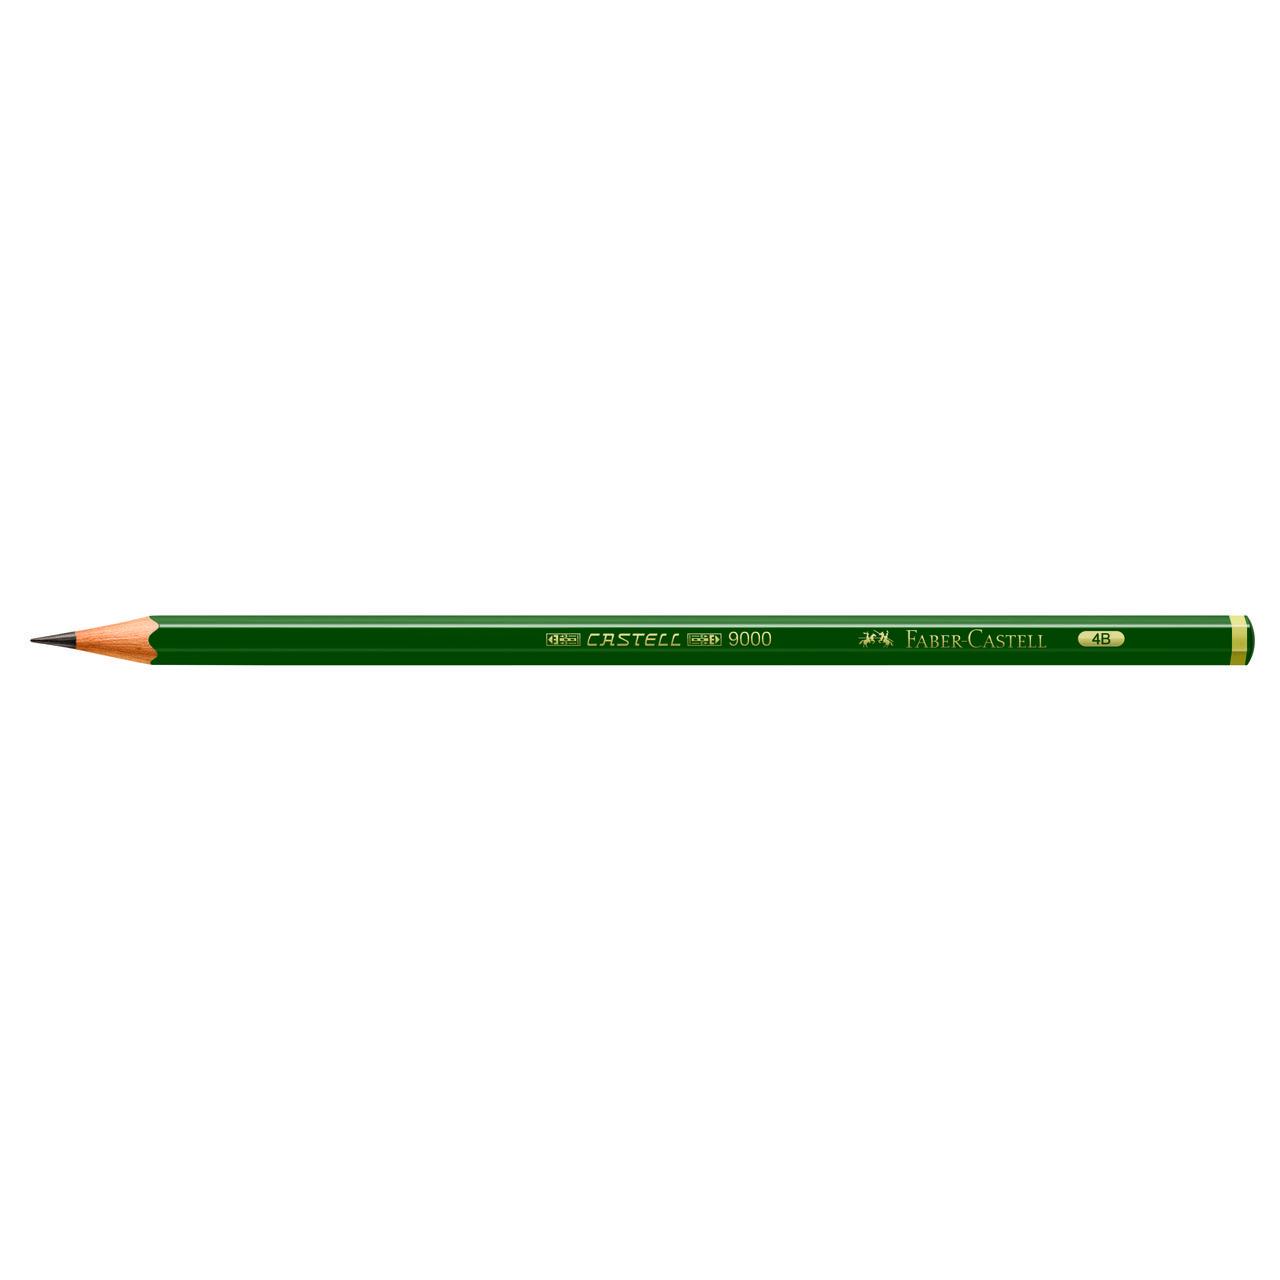 Lápis técnico 4B 9000 Faber-Castell